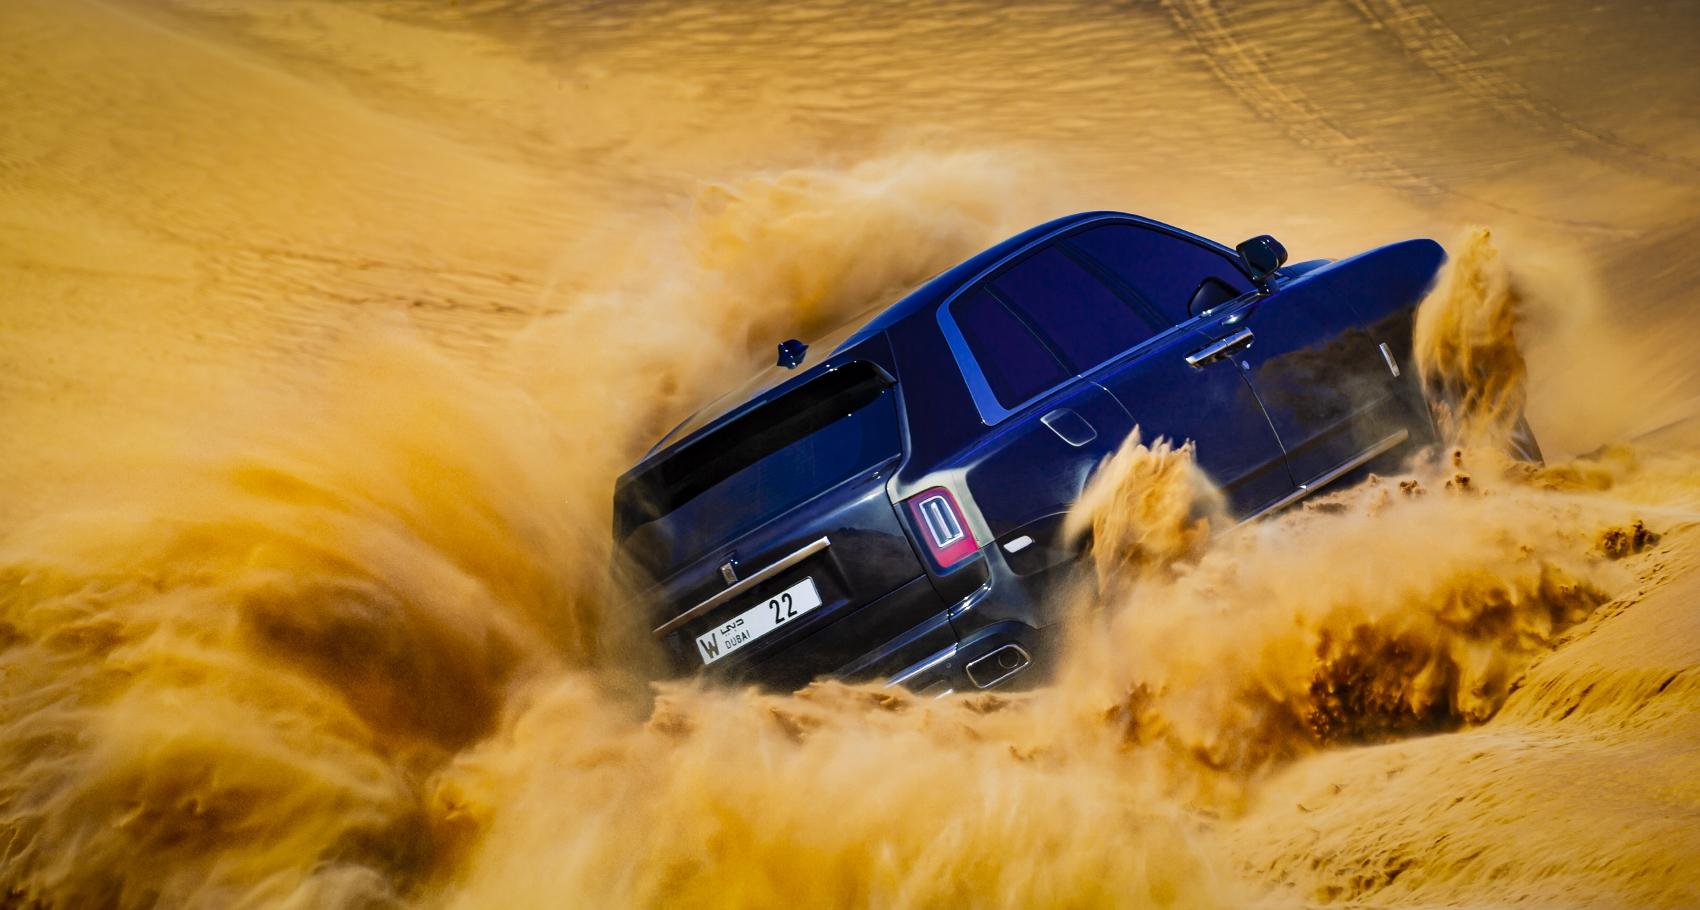 Rolls Royce Cullinan sa predviedol na púšti. Pozrite si foto aj video 17G1r6Hefm rolls-royce-cullina